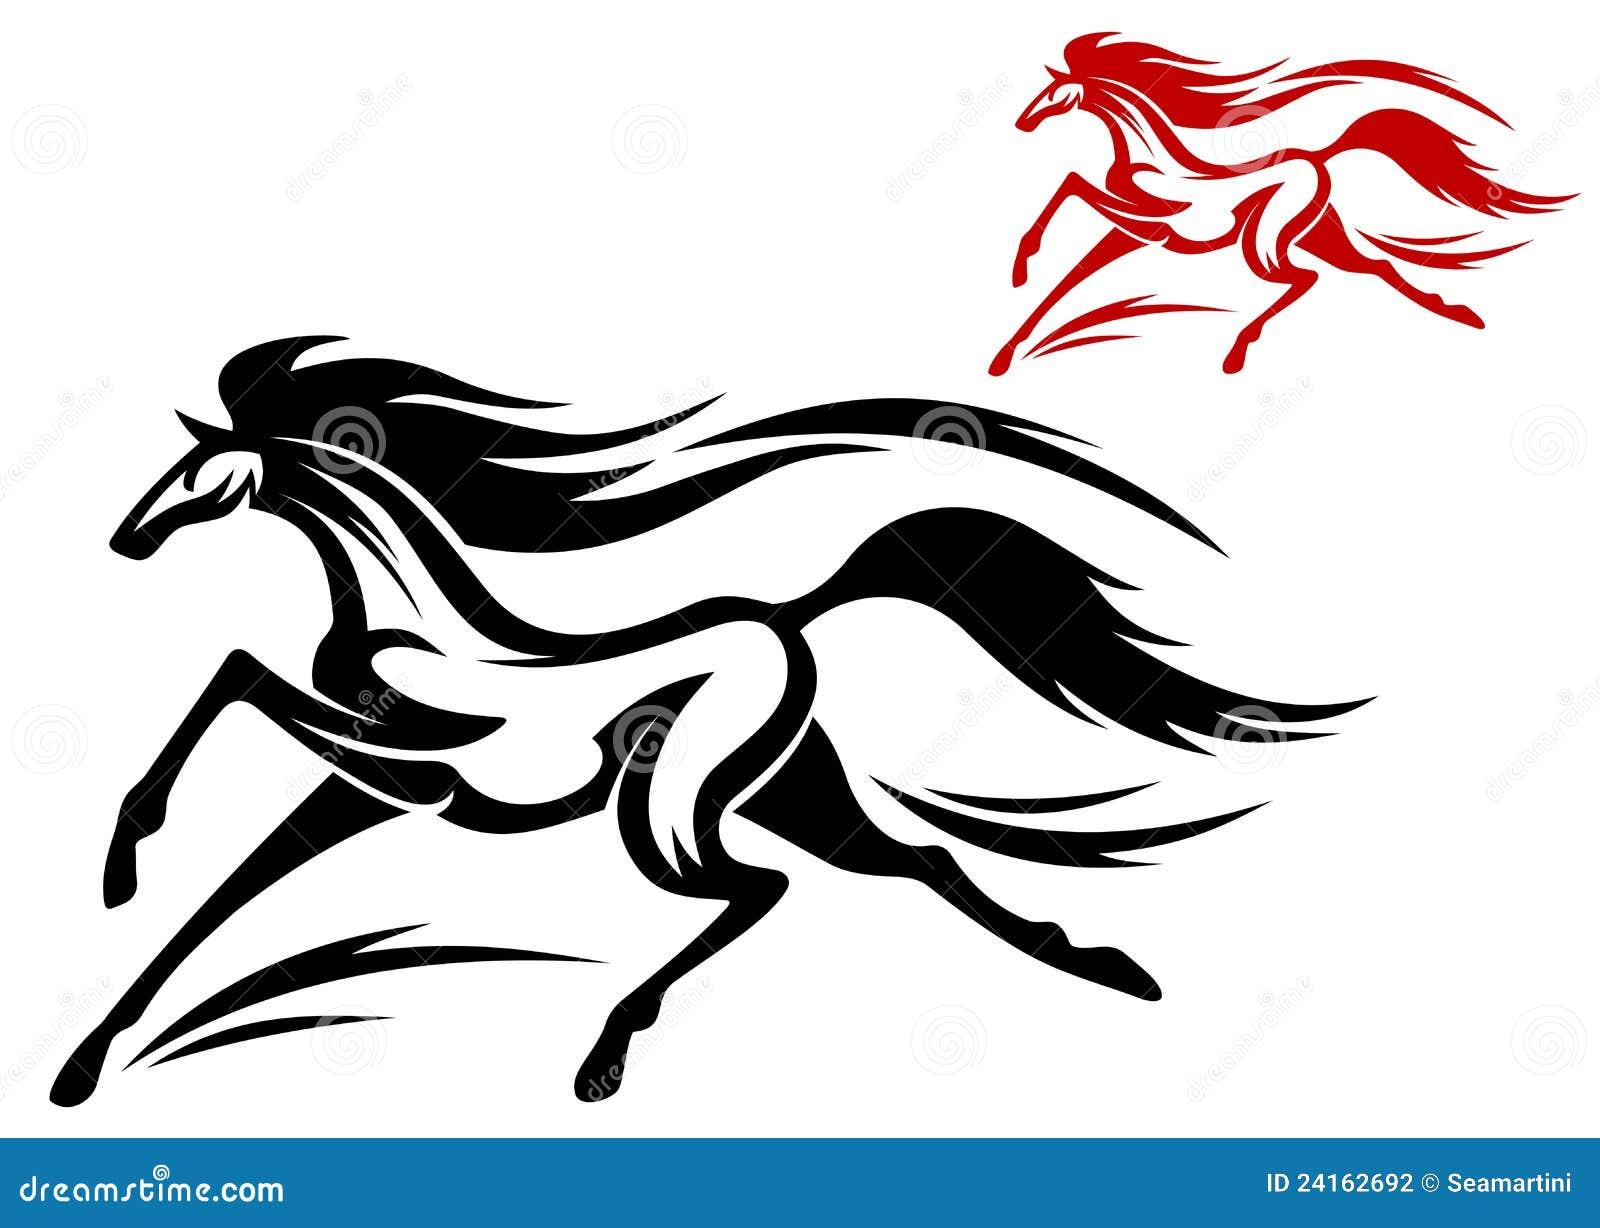 Running Horse Tattoo Stock Vector Illustration Of Beautiful 24162692